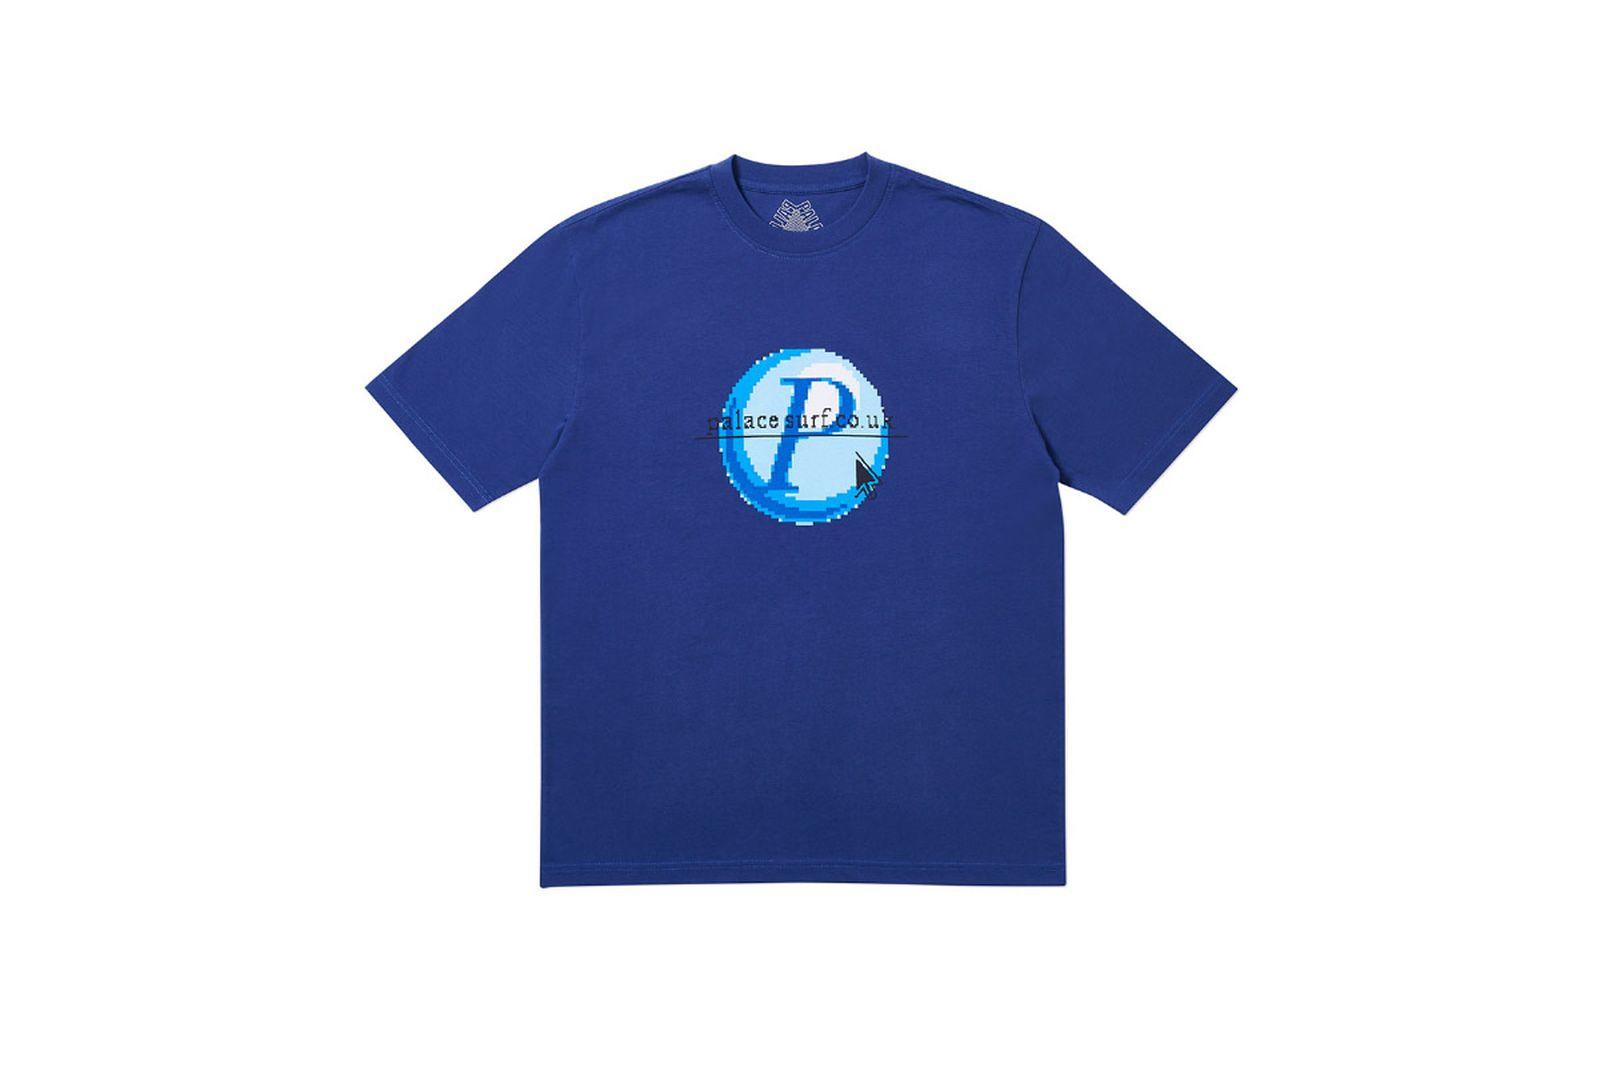 Palace 2019 Autumn T Shirt Log On blue